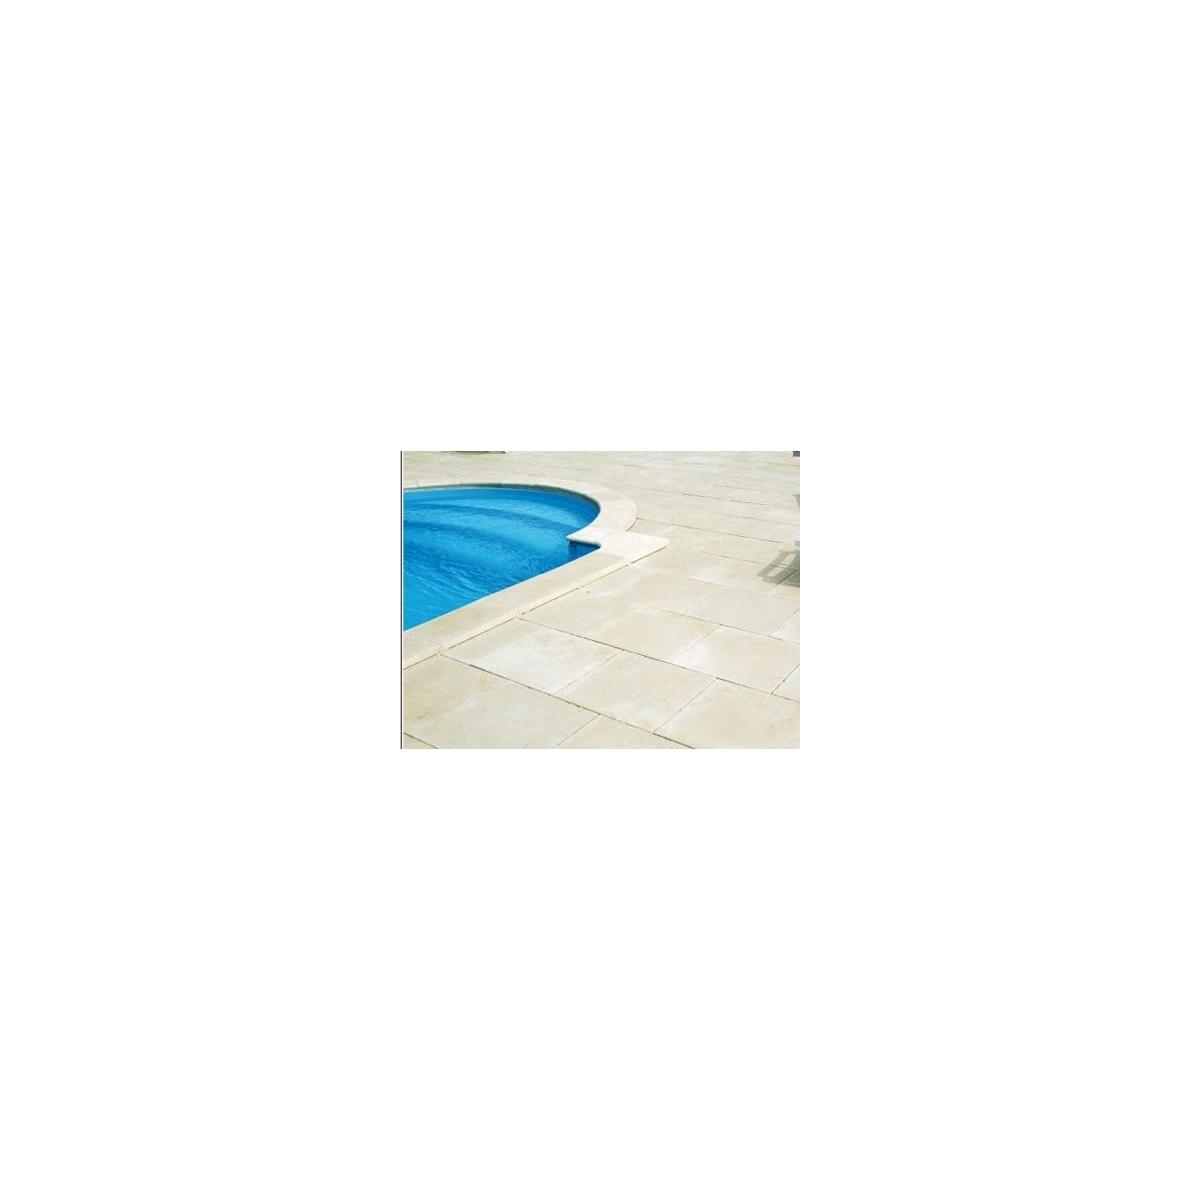 Losa plana para playa de piscina 100x50x3